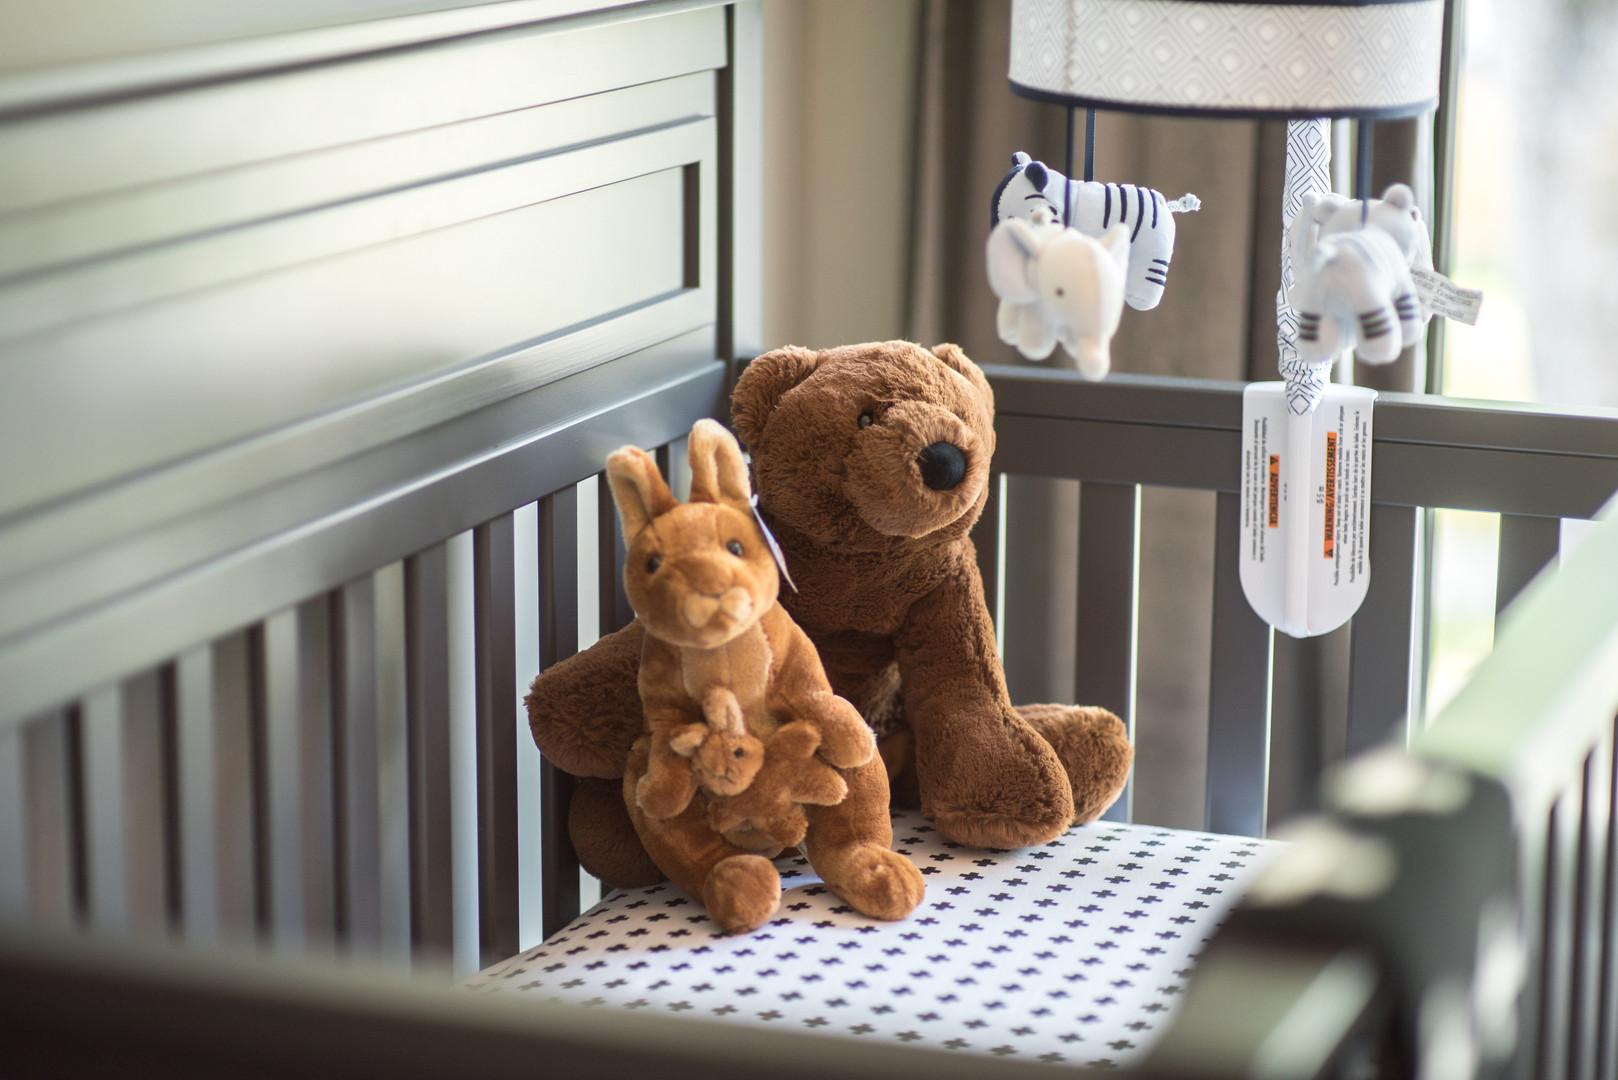 Nursery Crib & Toys